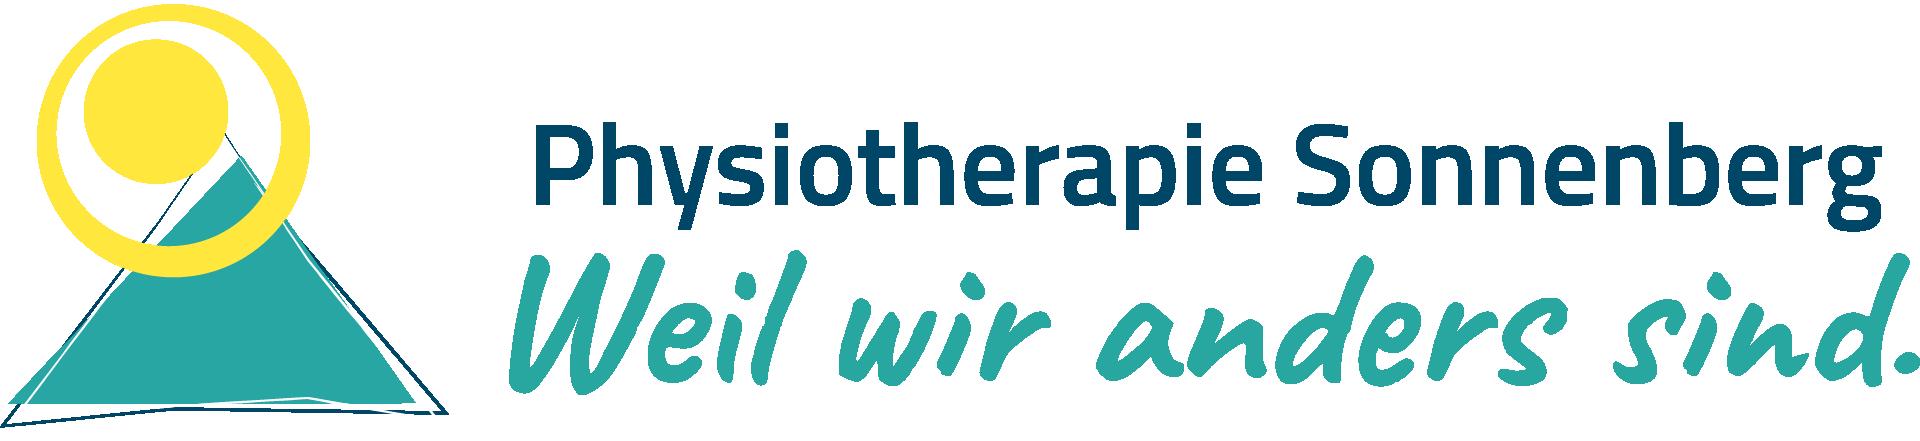 Physiotherapie Sonnenberg Meerane